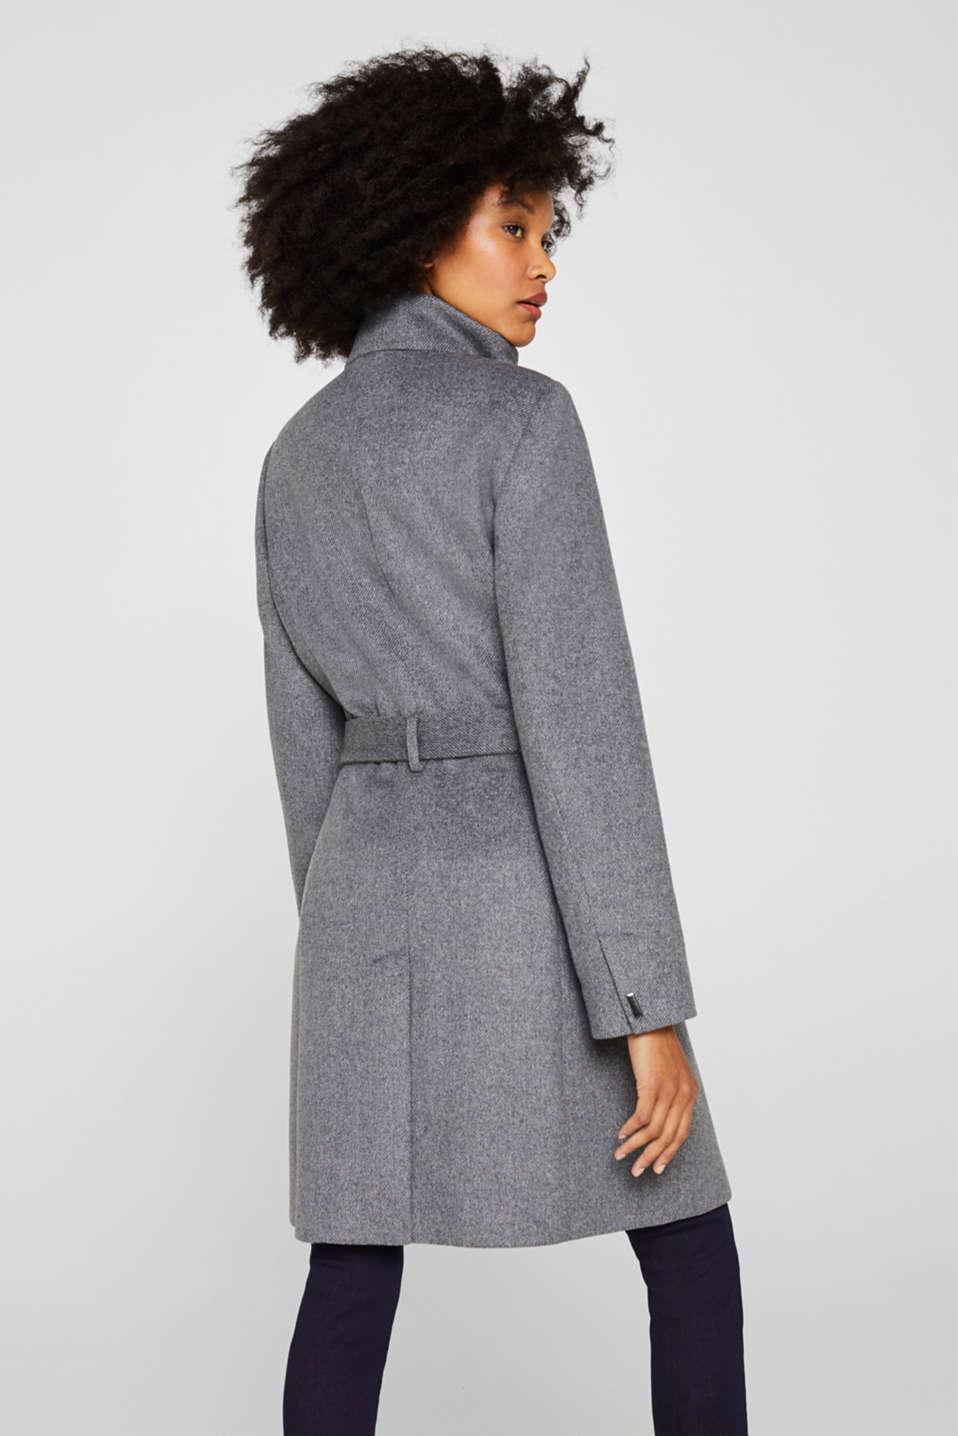 With wool: Coat with tie-around belt, GUNMETAL 5, detail image number 3